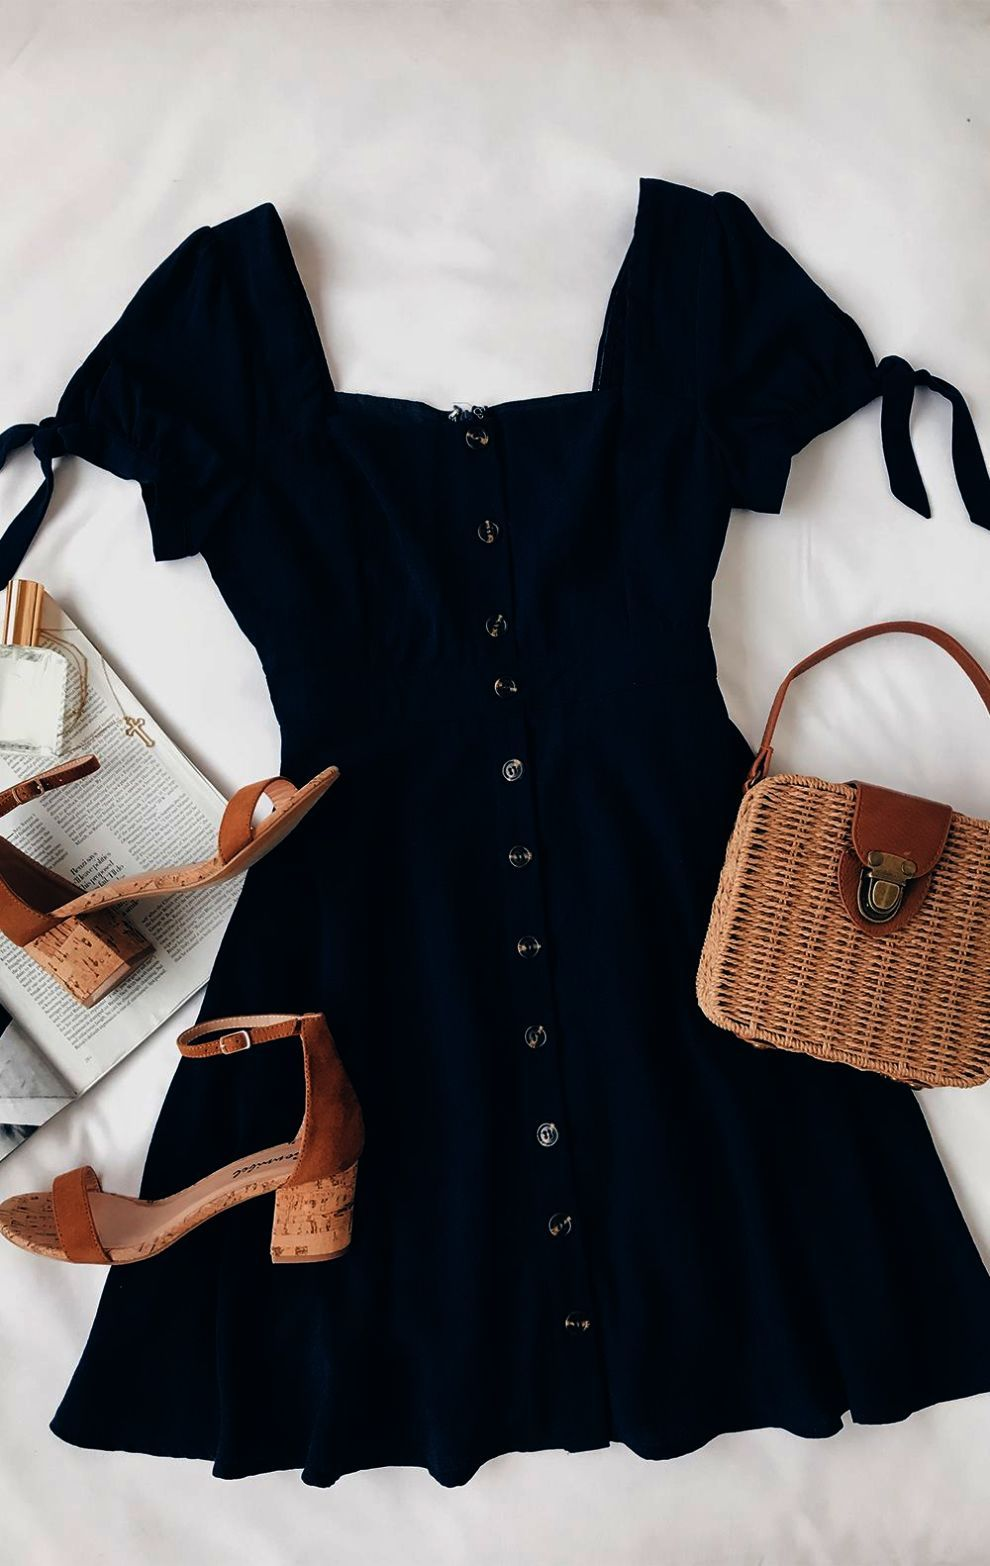 Summer clothing trends womenus summer outfits lookbook